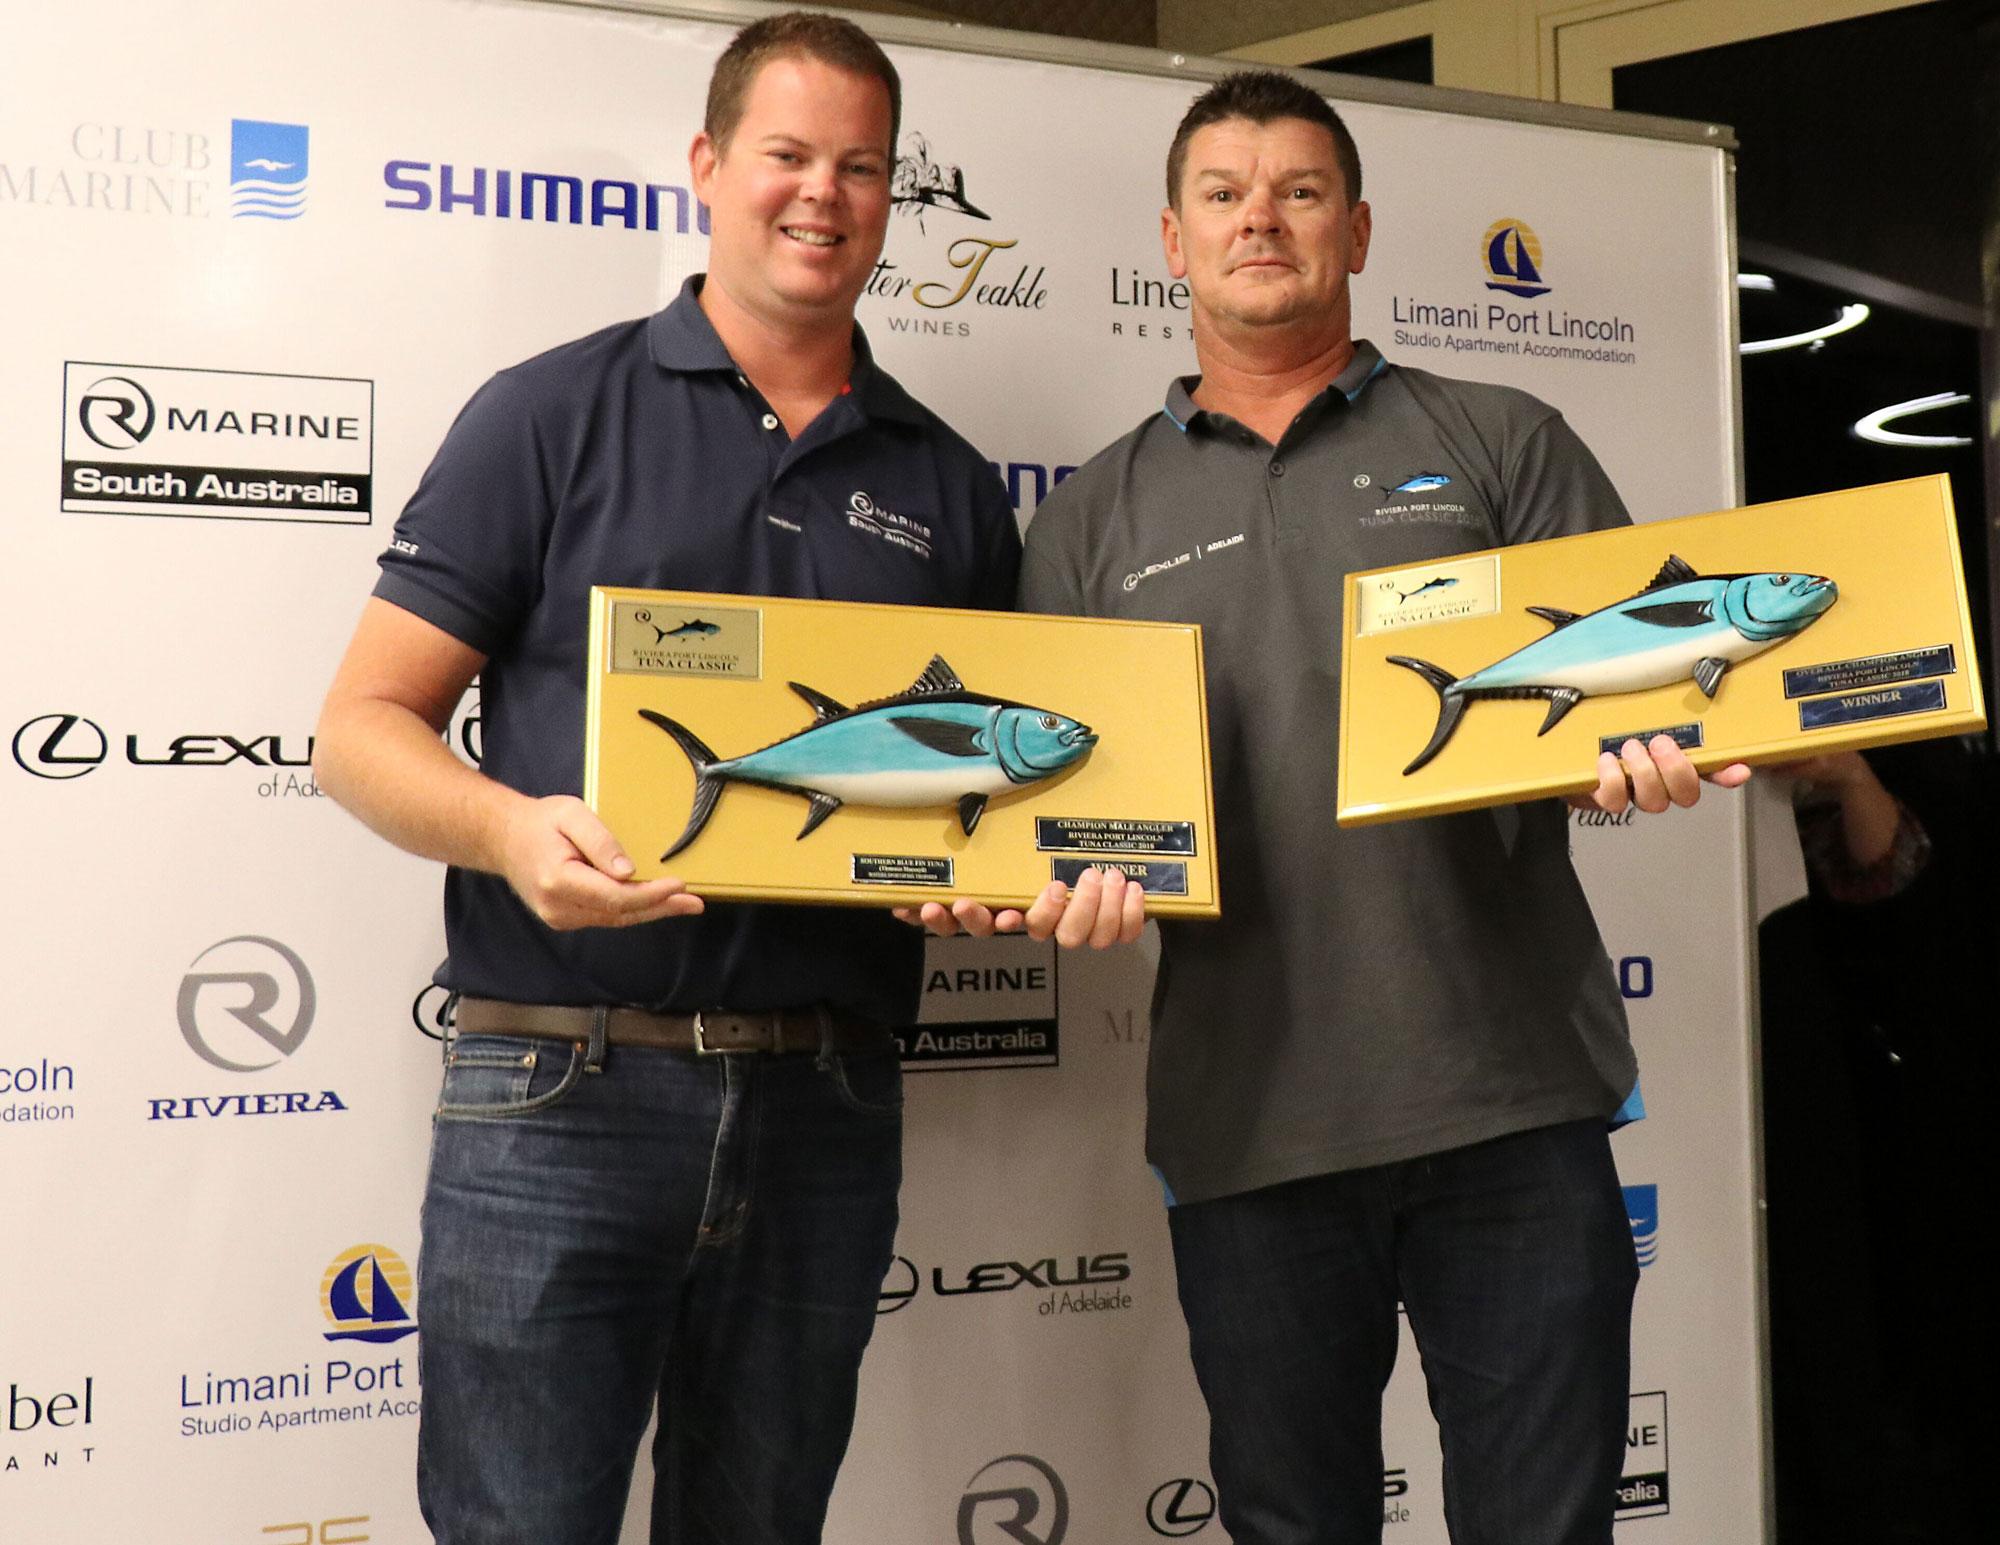 R Marine SA's Daniel Westbury presents the 2018 Champion Angler award to Jeremy Cooper.